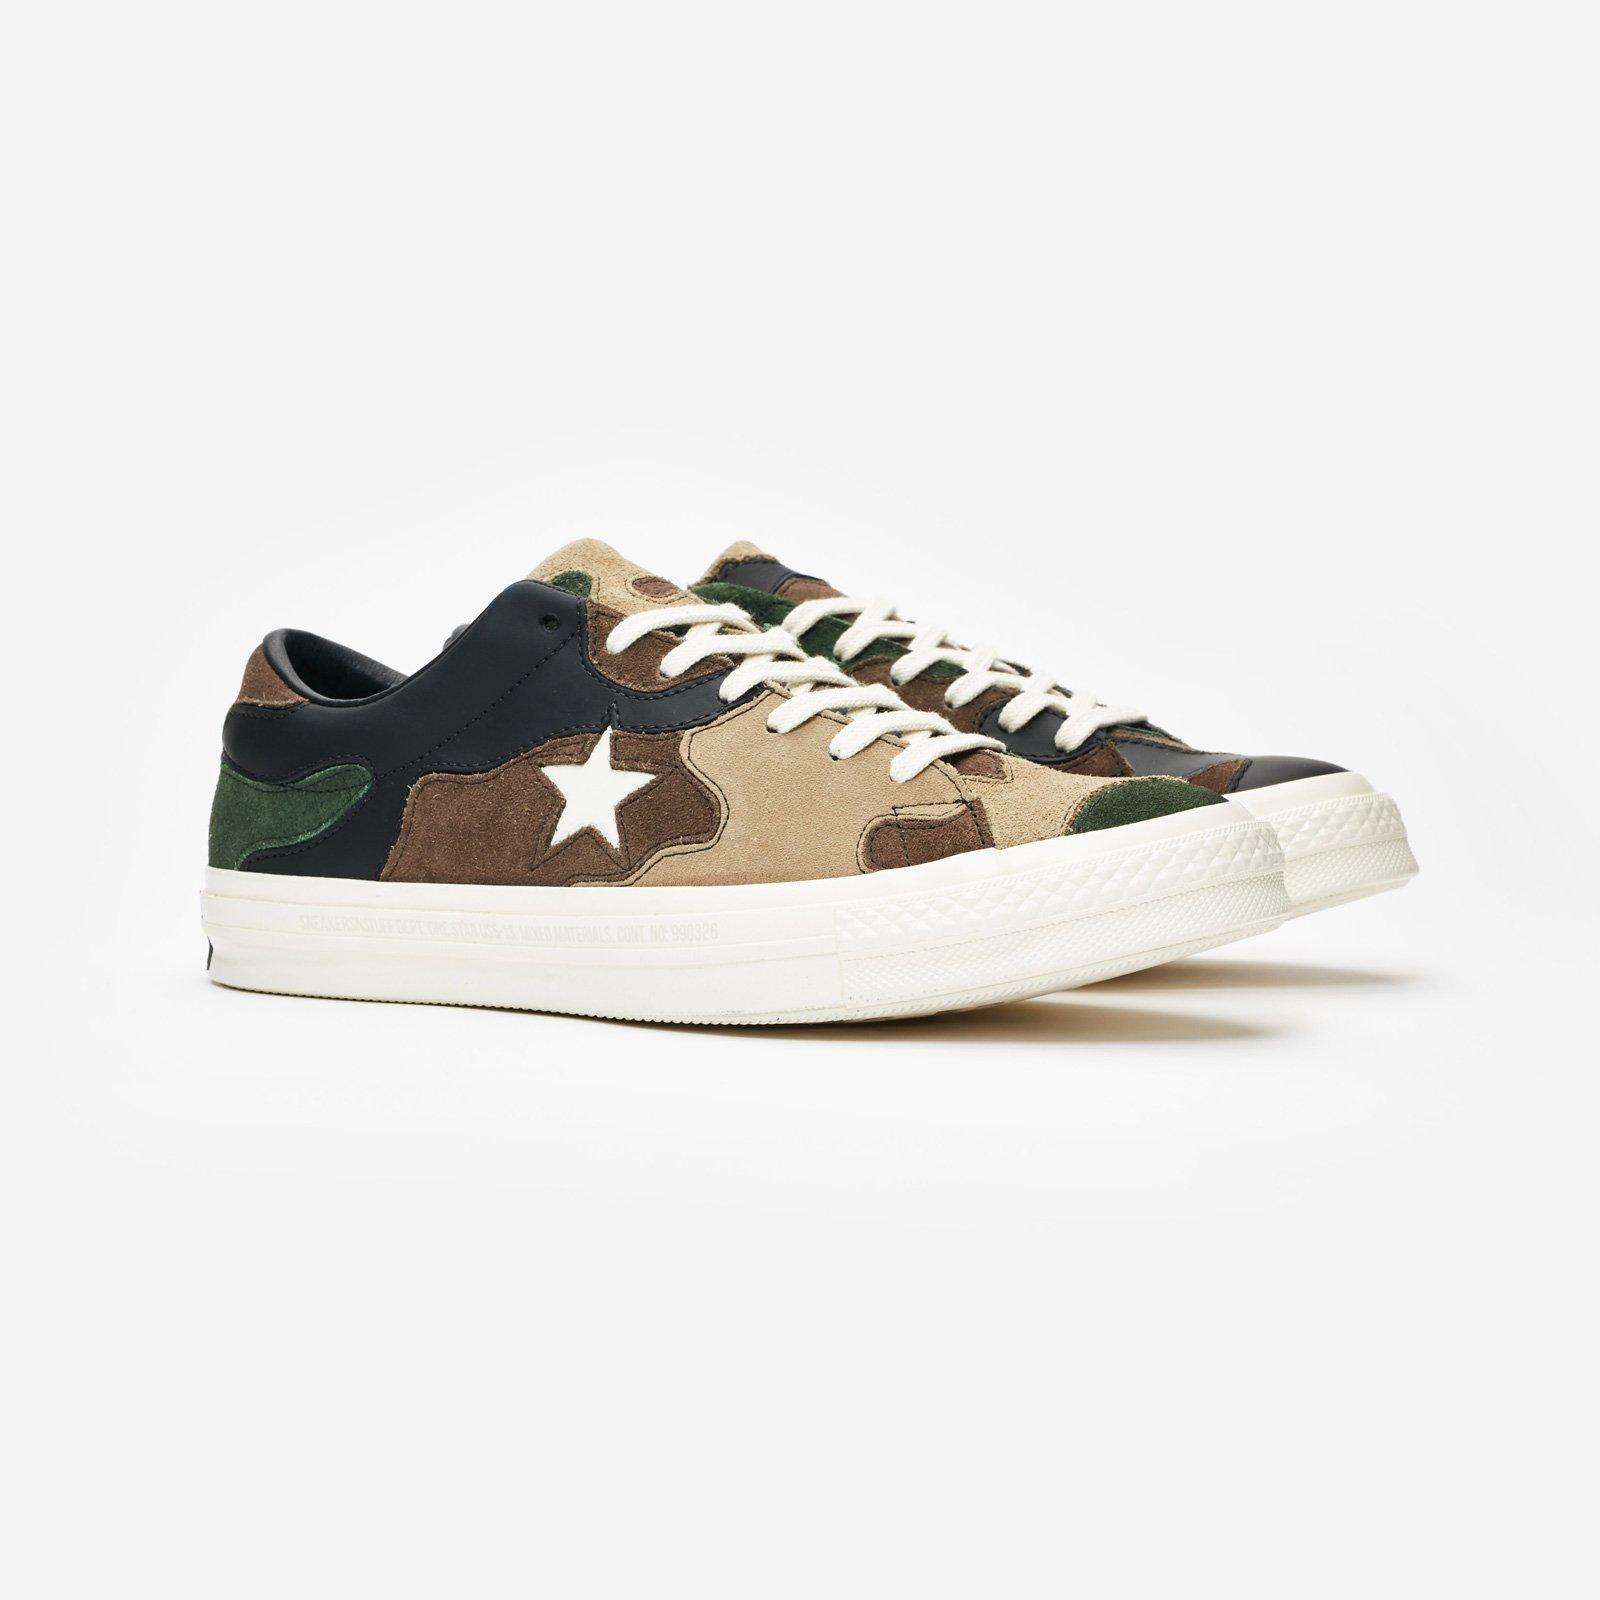 plutôt sympa 73ea2 dfdda Converse One Star x Sneakersnstuff - 161406c ...